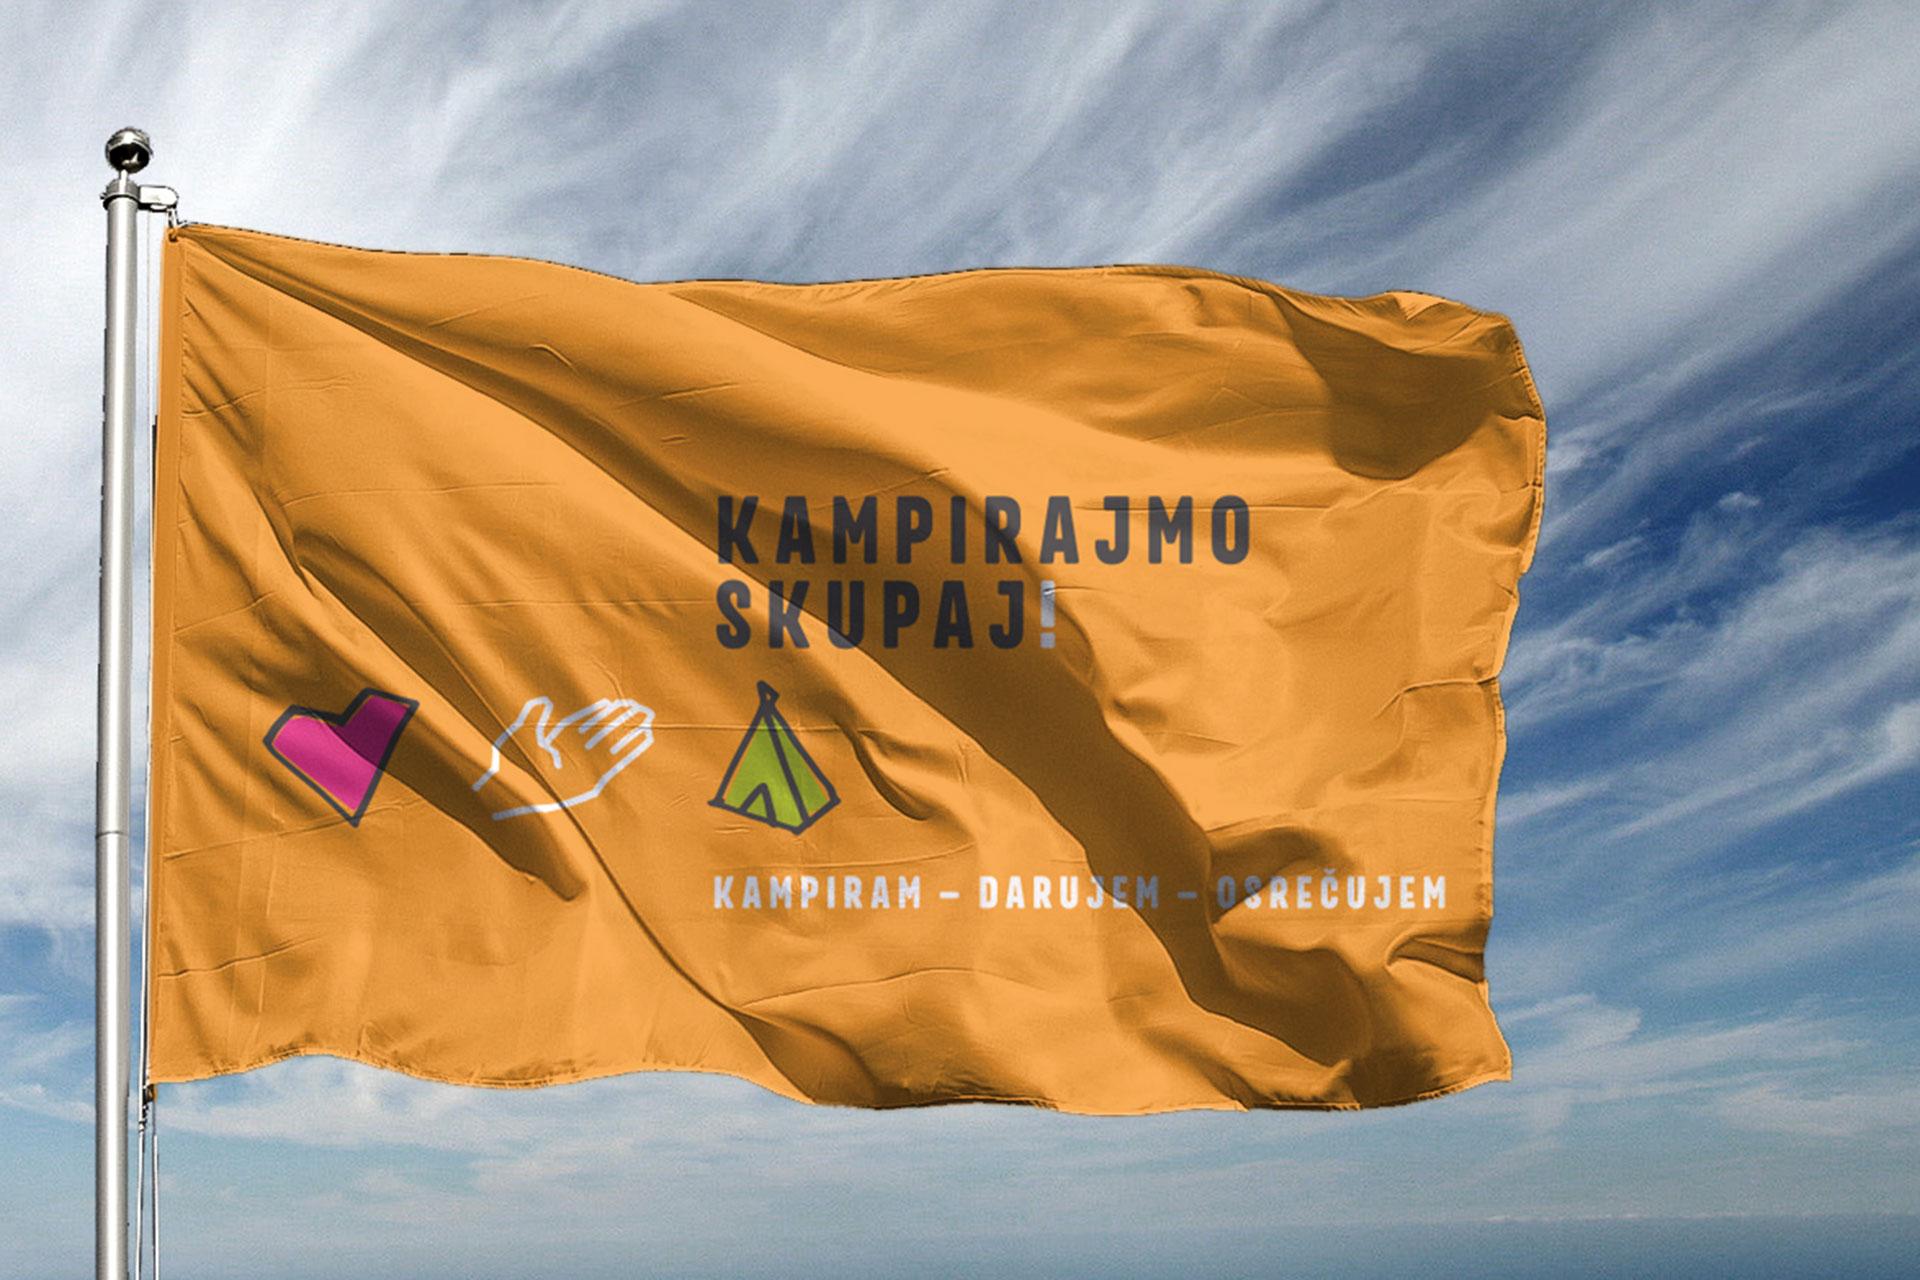 zastava-kampirajmo_skupaj_marko_marinsek_studio-ma-ma_TShirt-Mockup